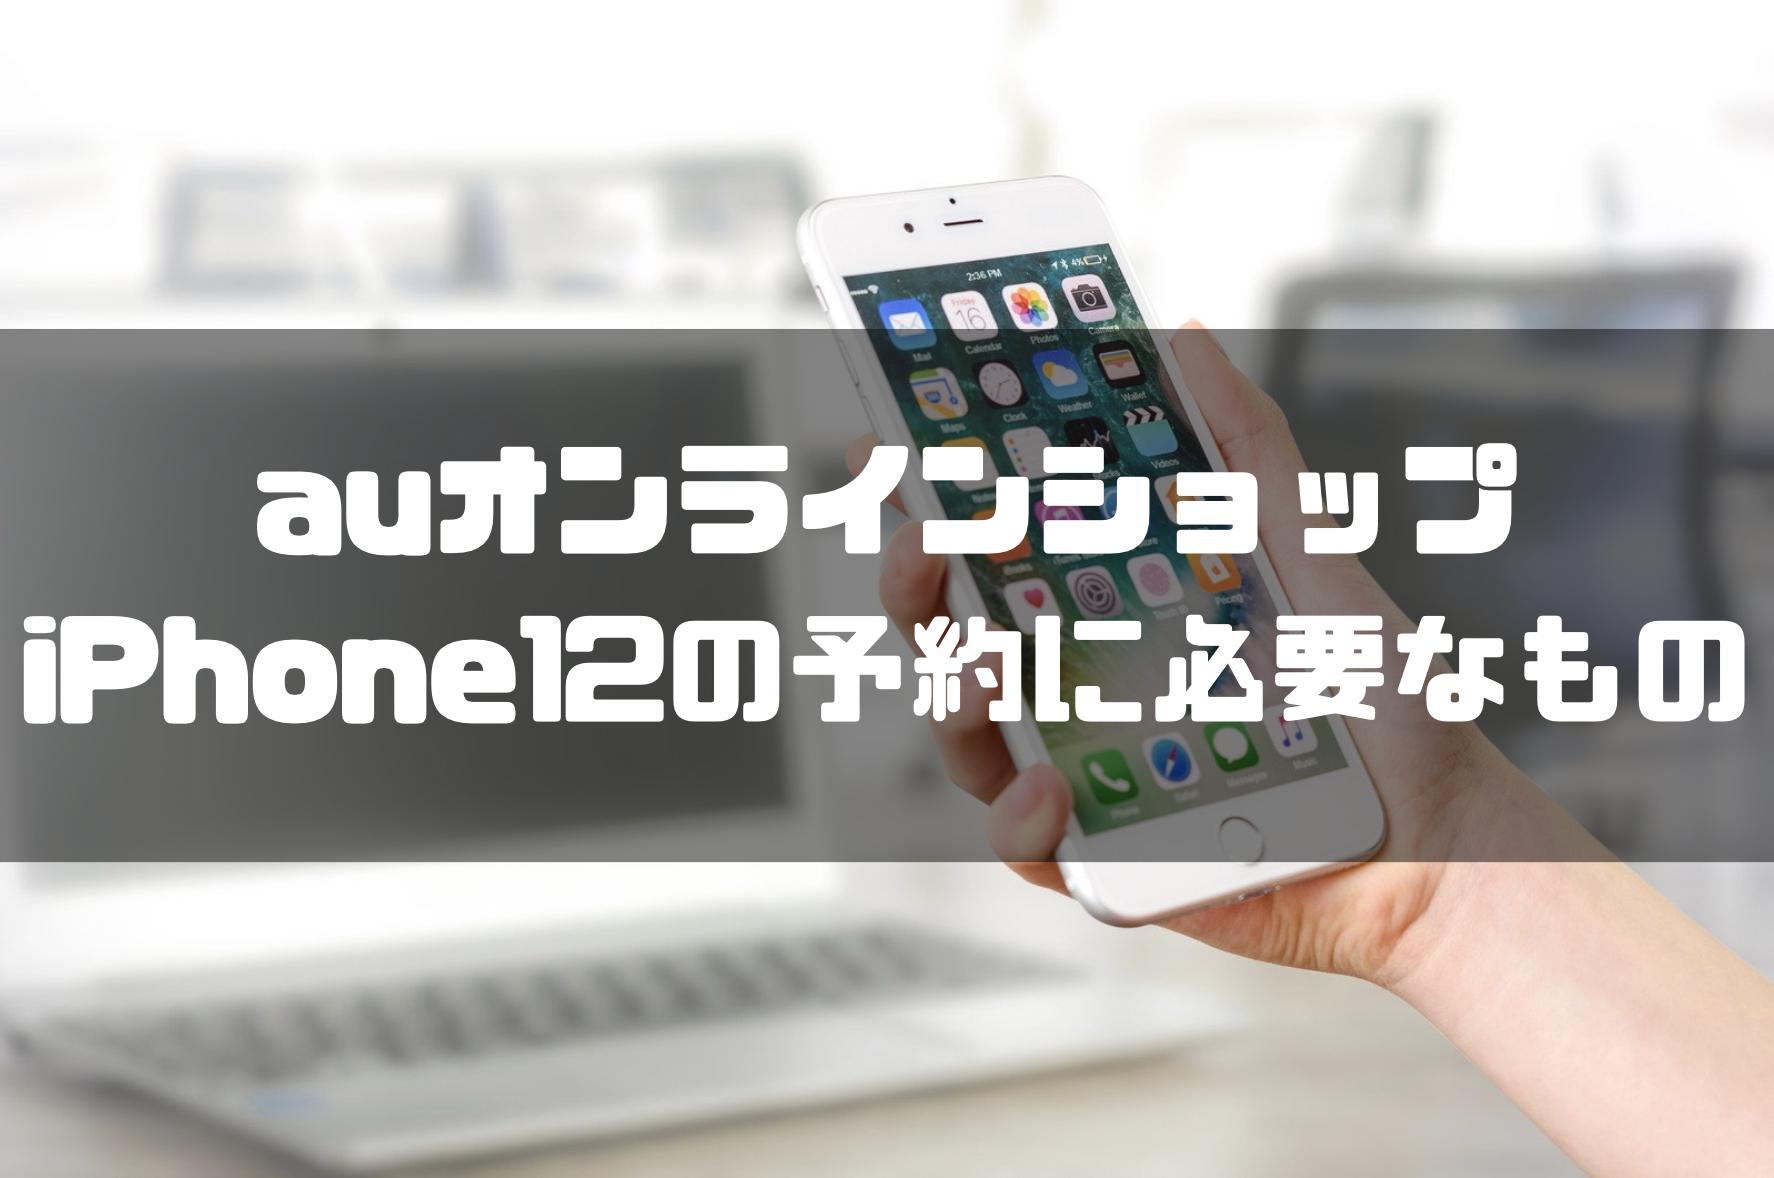 iPhone12_auオンラインショップ_必要なもの